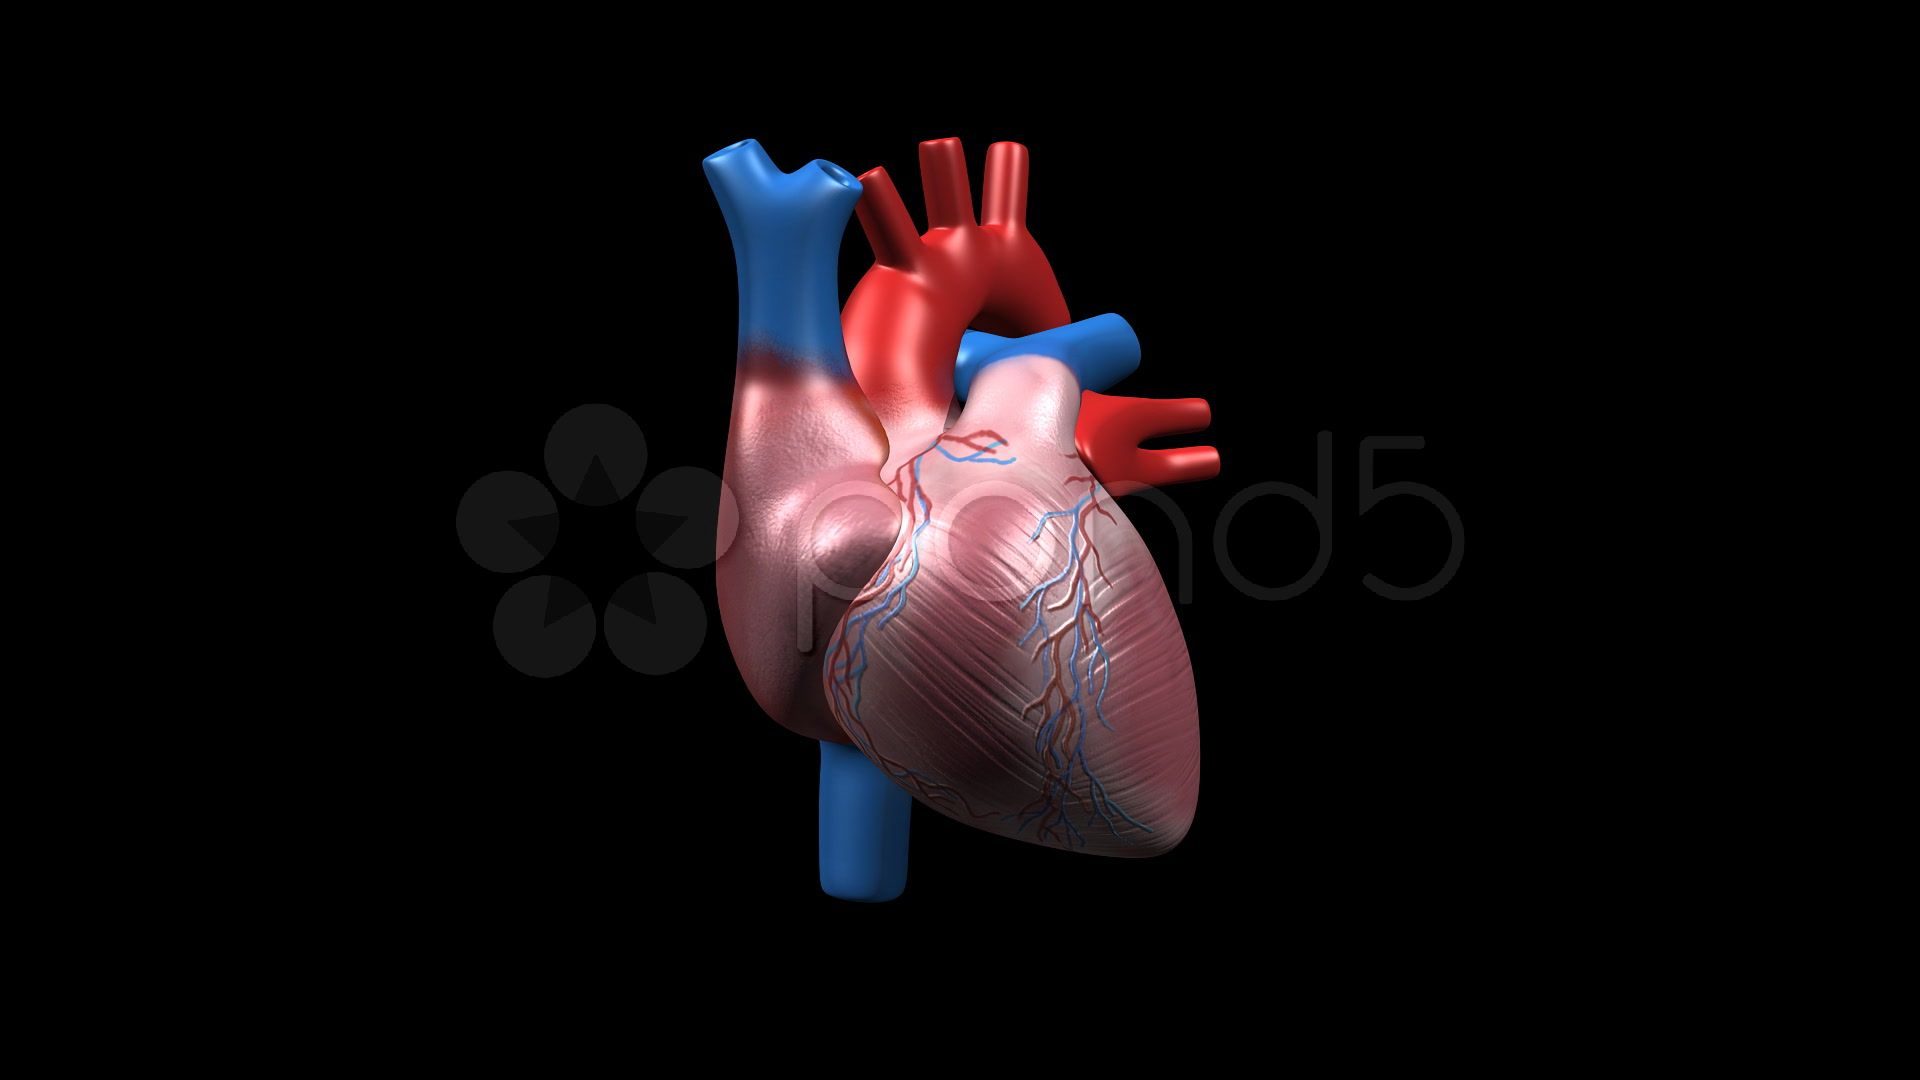 Human Heart CU, 360 Degree Rotation. Corazón humano, con 360 grados ...